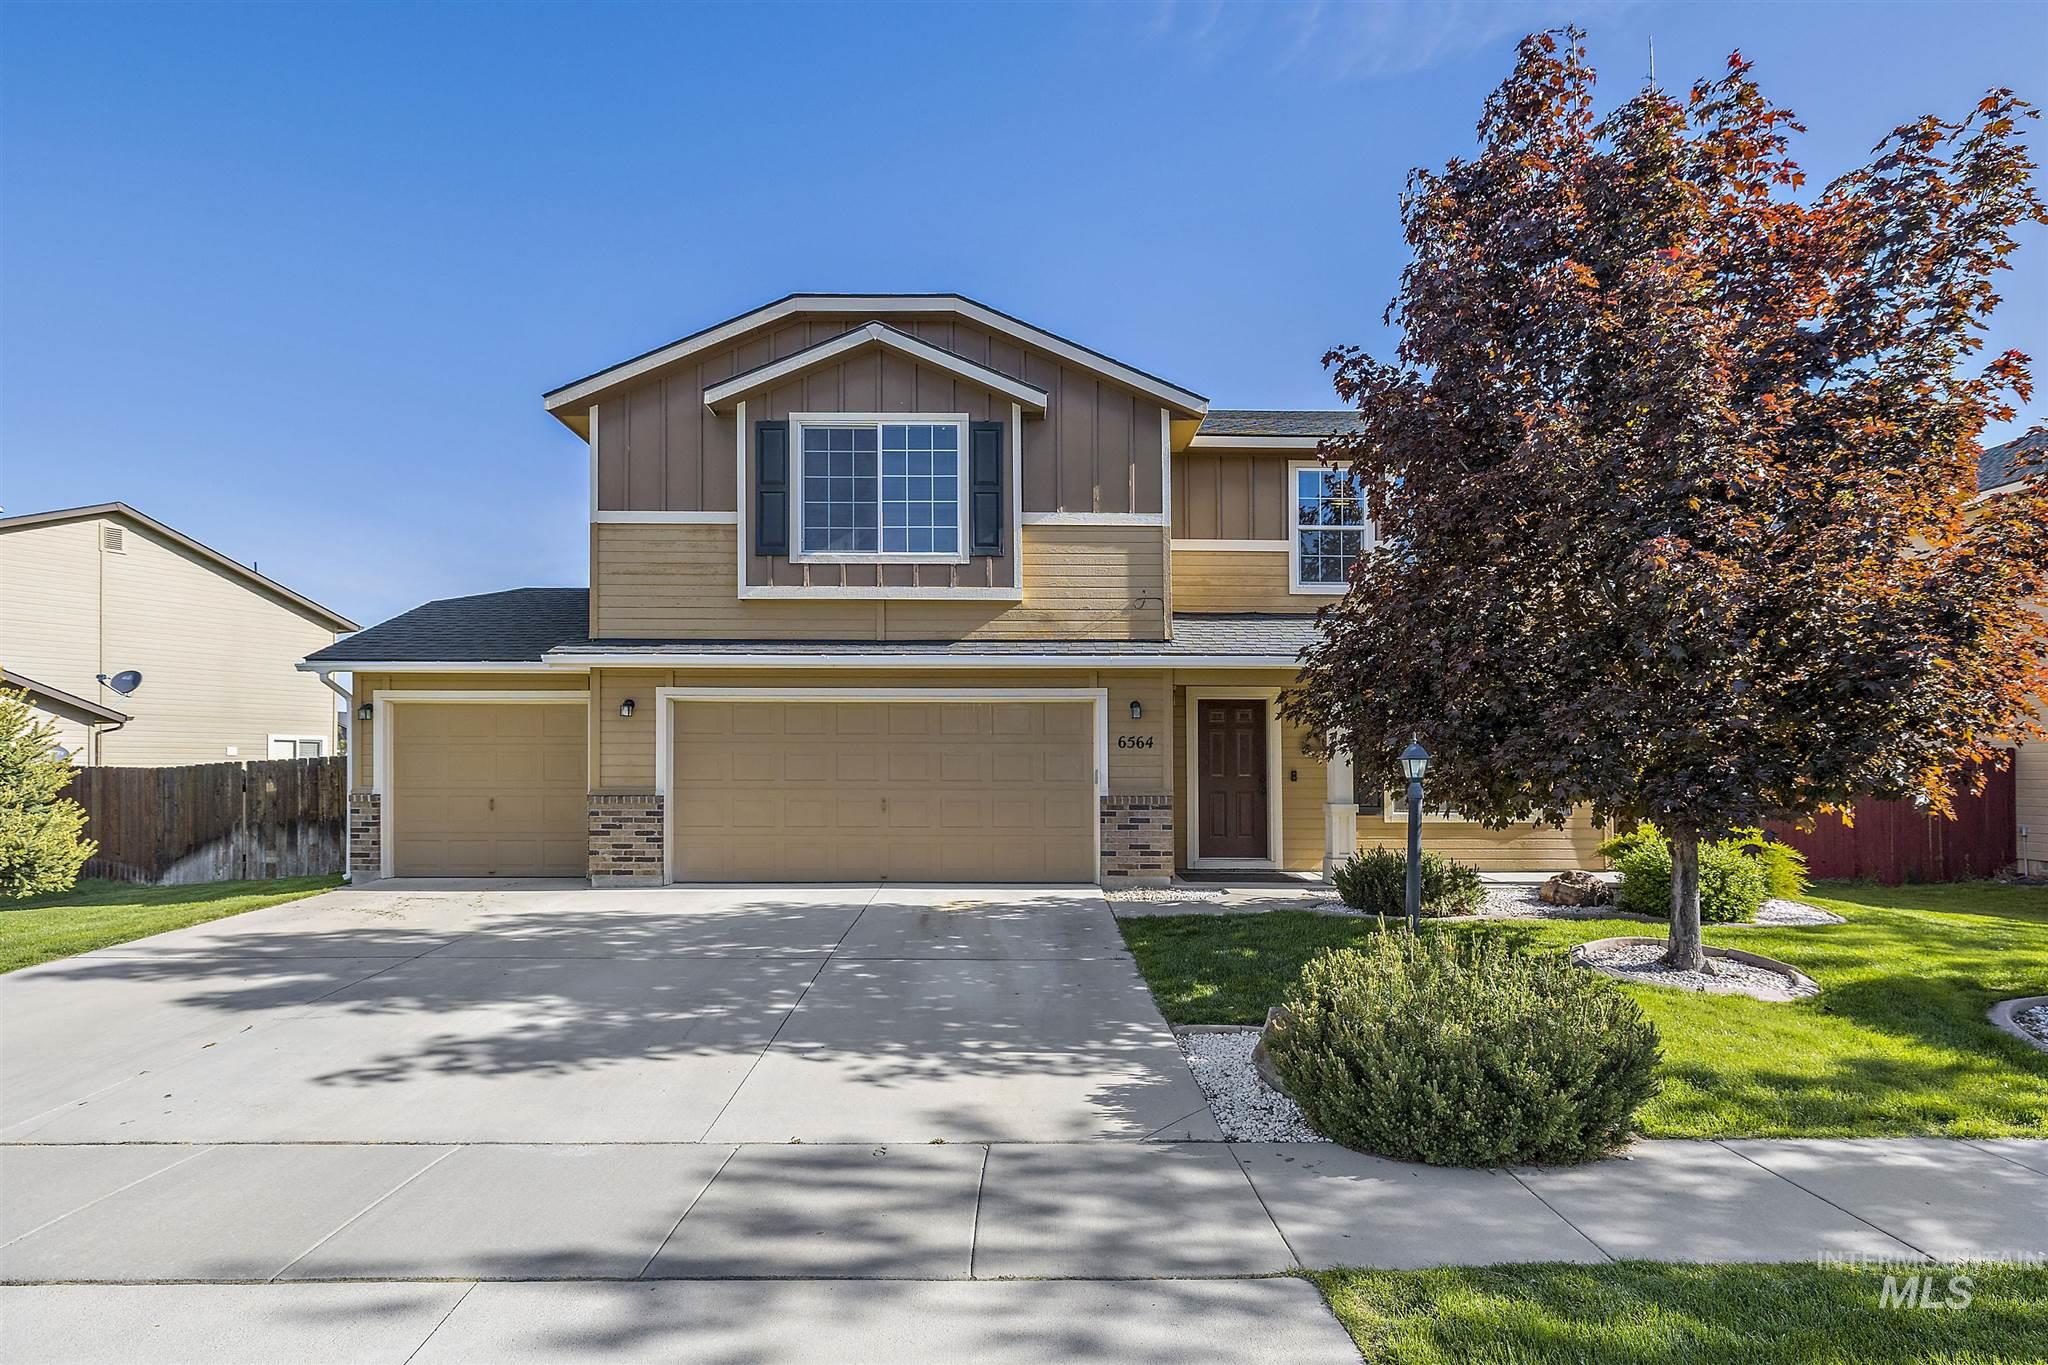 6564 E Harrington Dr Property Photo - Nampa, ID real estate listing